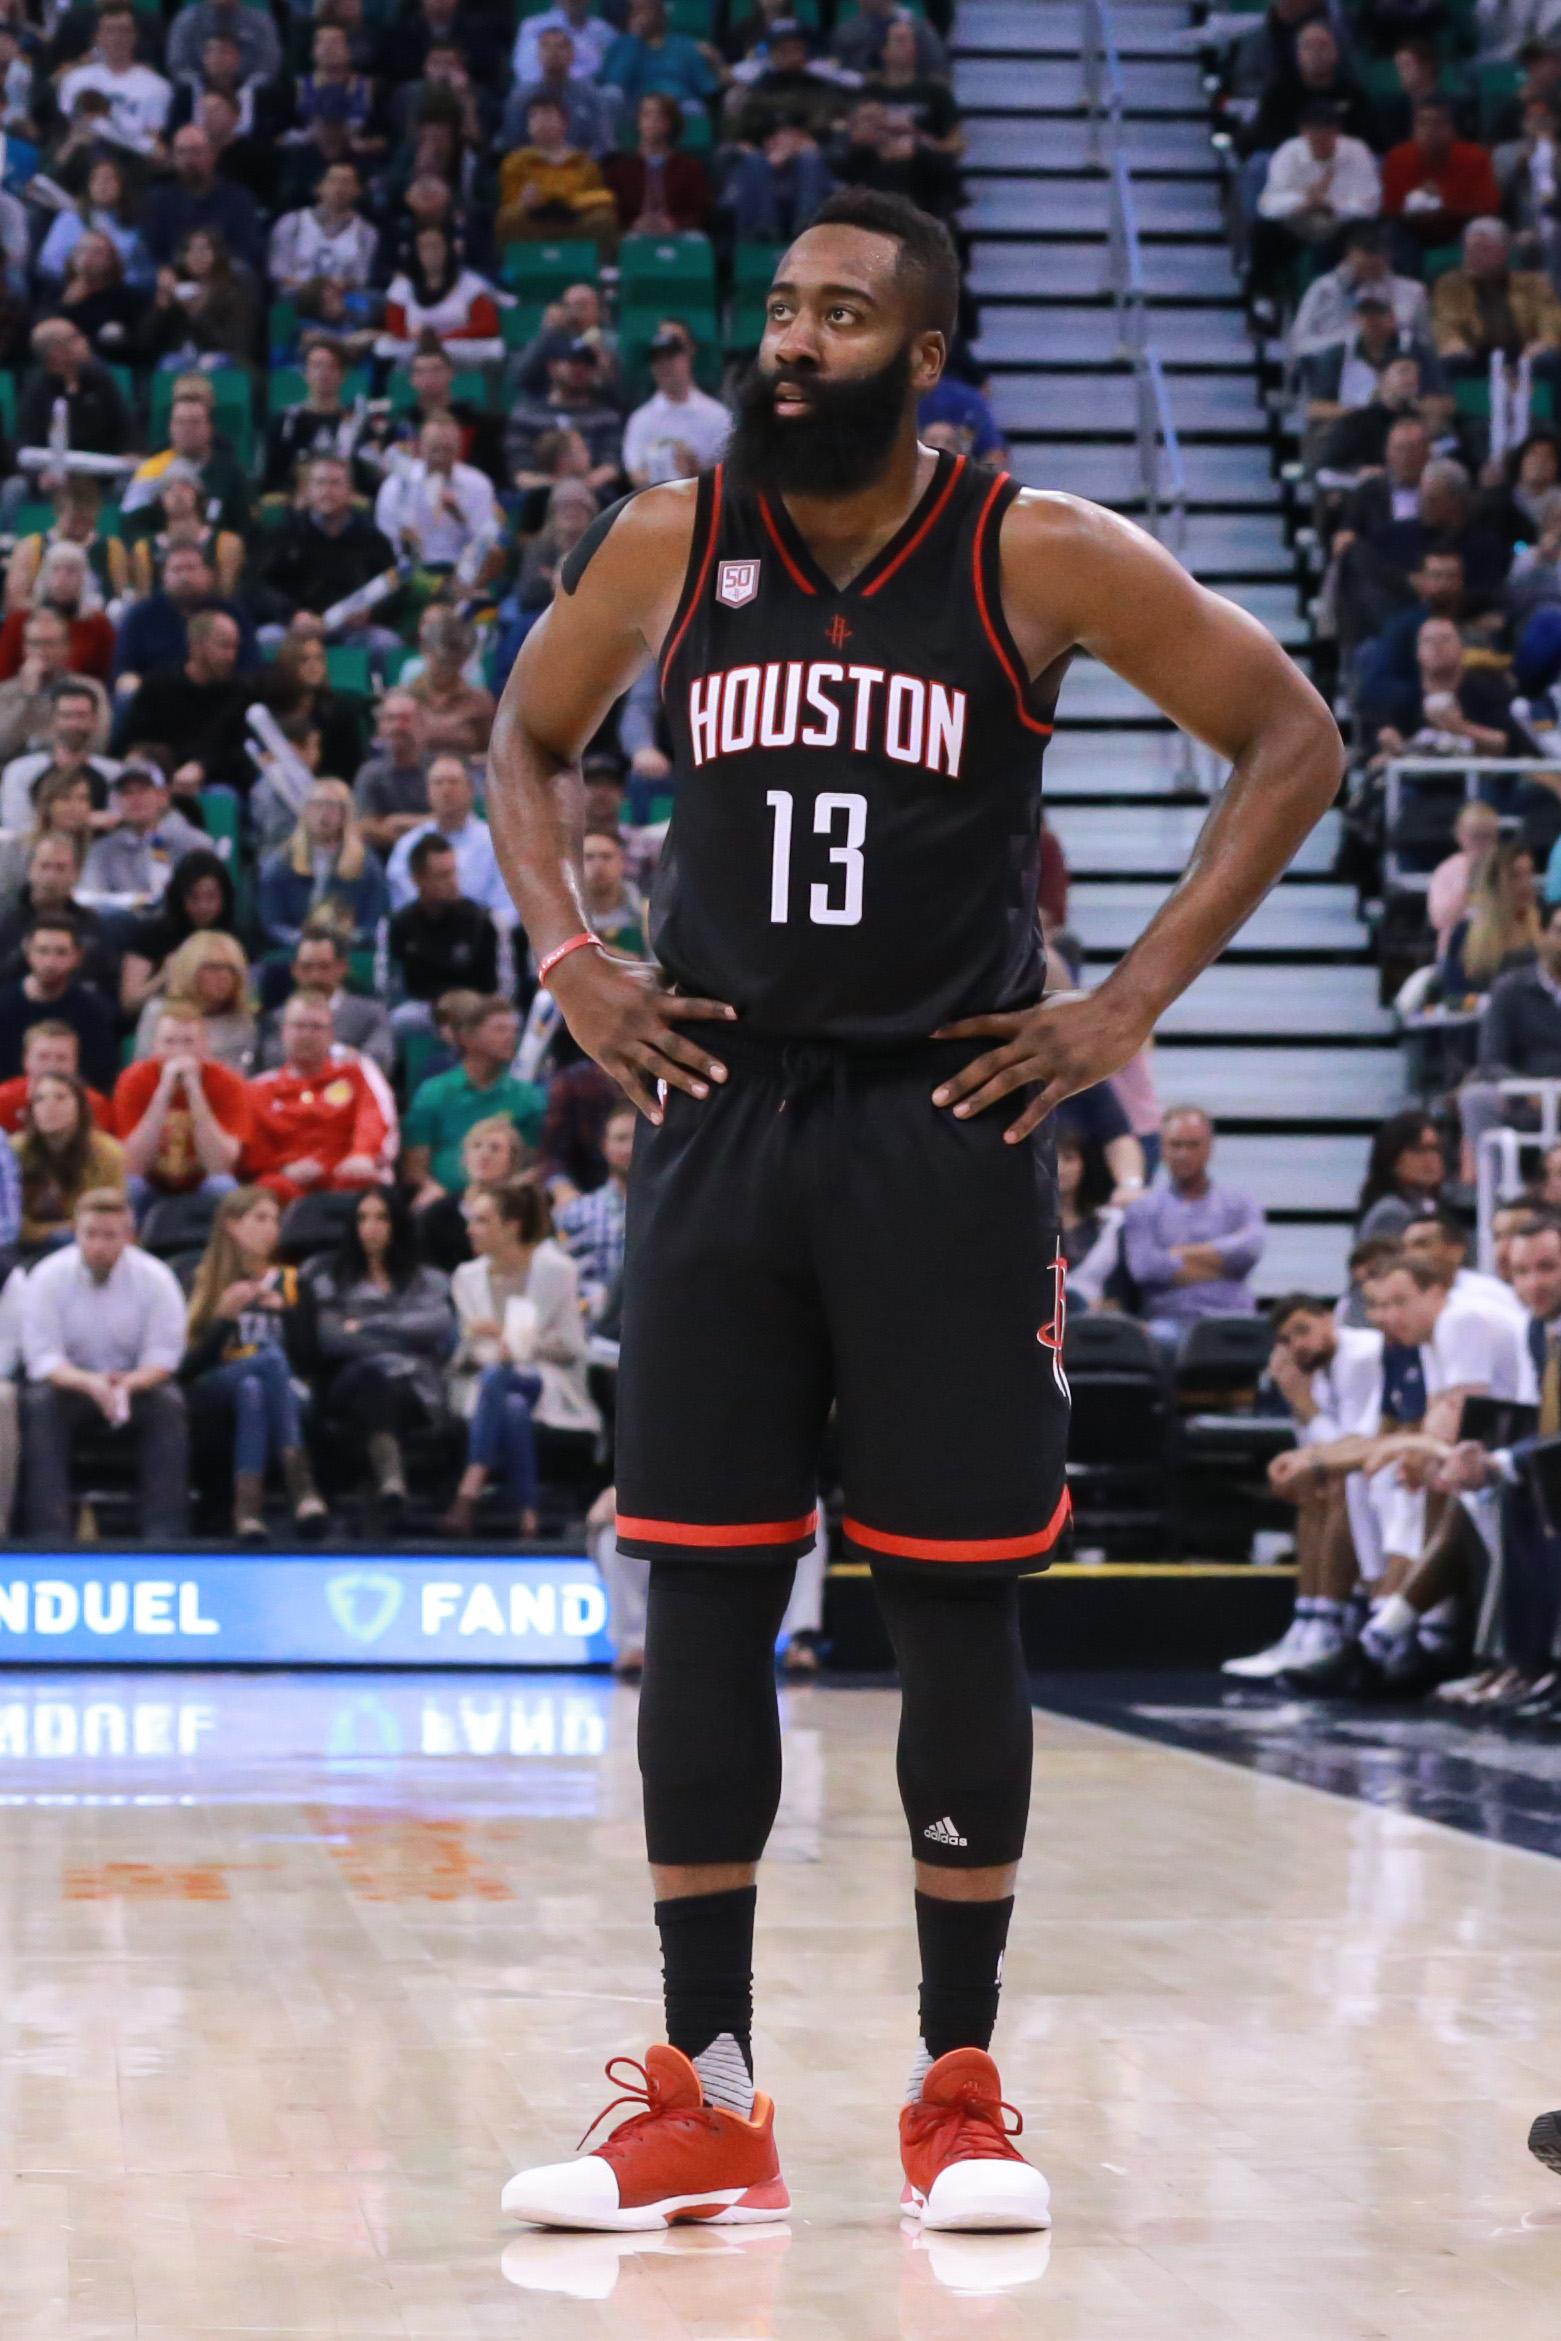 NBA Thursday : Houston Rockets take on the Golden State Warriors - Prediction